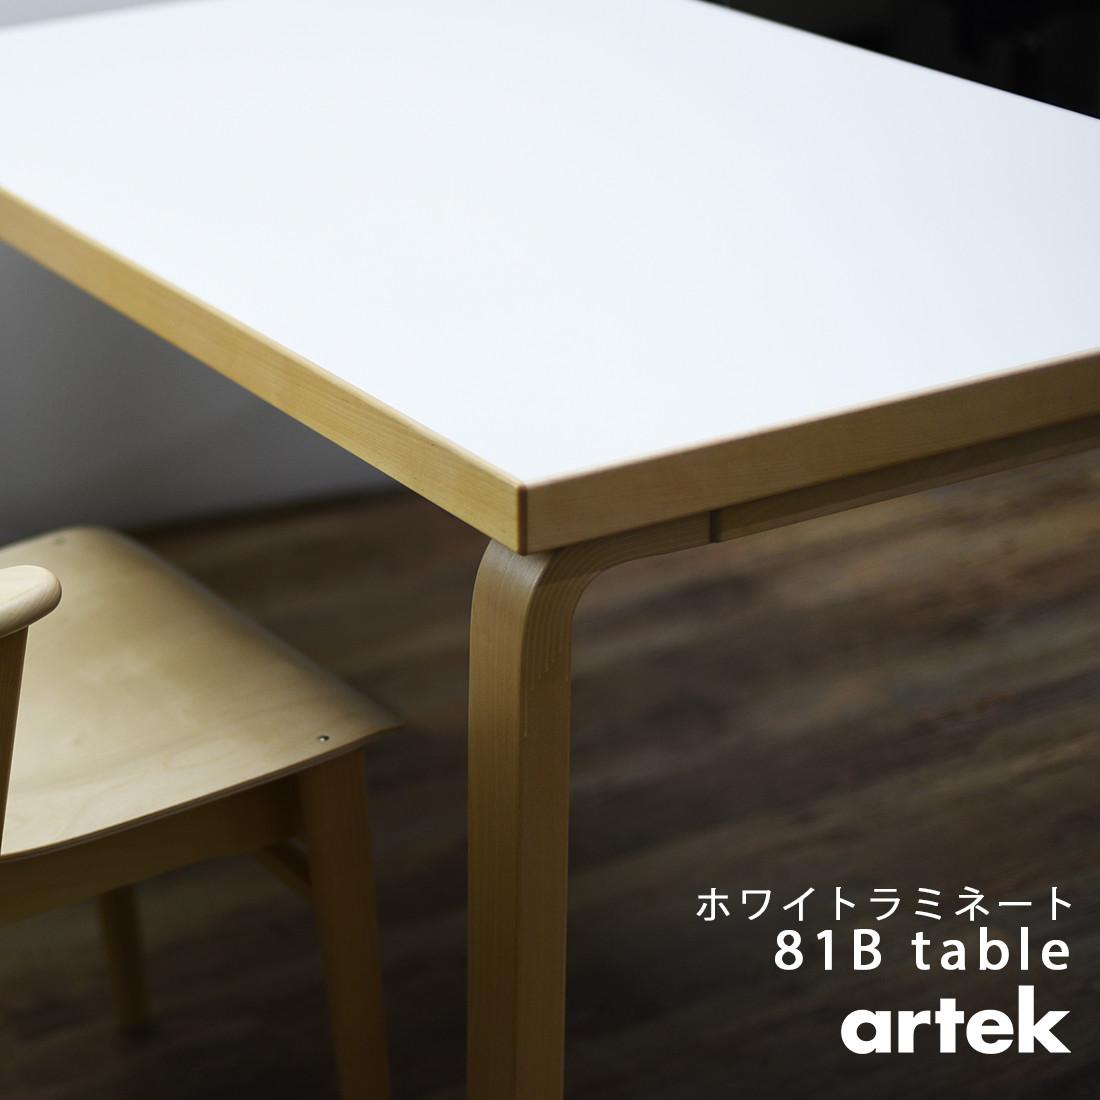 【artek/アルテック】TABLE 81B テーブル ホワイトラミネート 120x75x72cmダイニング/曲げ木